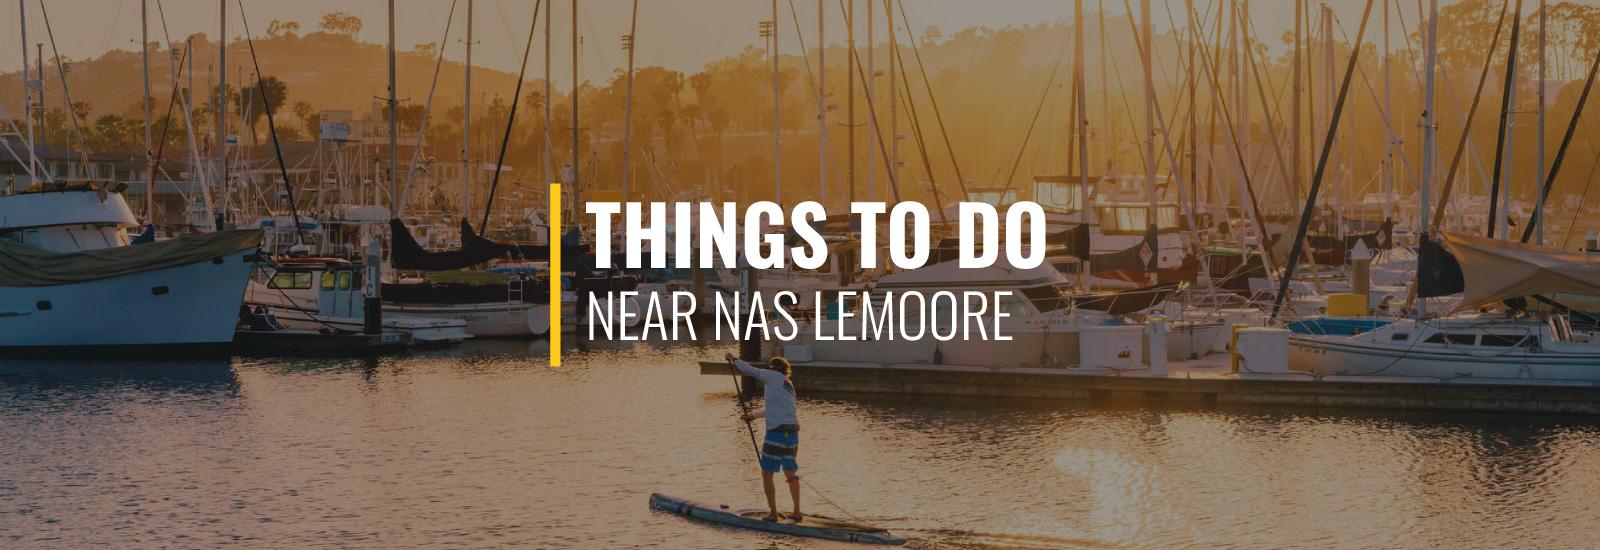 Things to Do Near NAS Lemoore